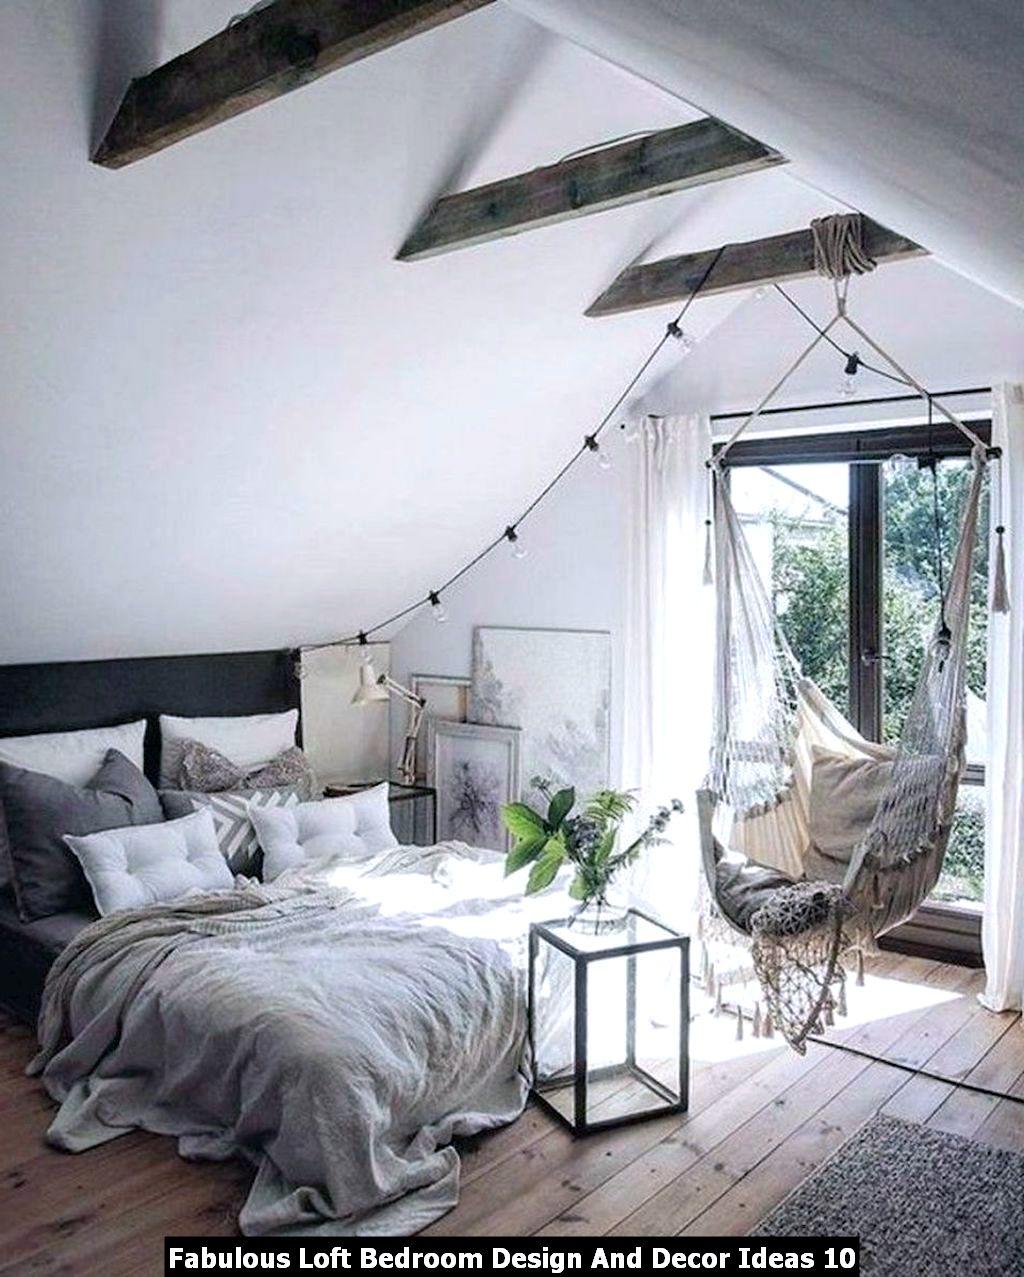 Fabulous Loft Bedroom Design And Decor Ideas 10